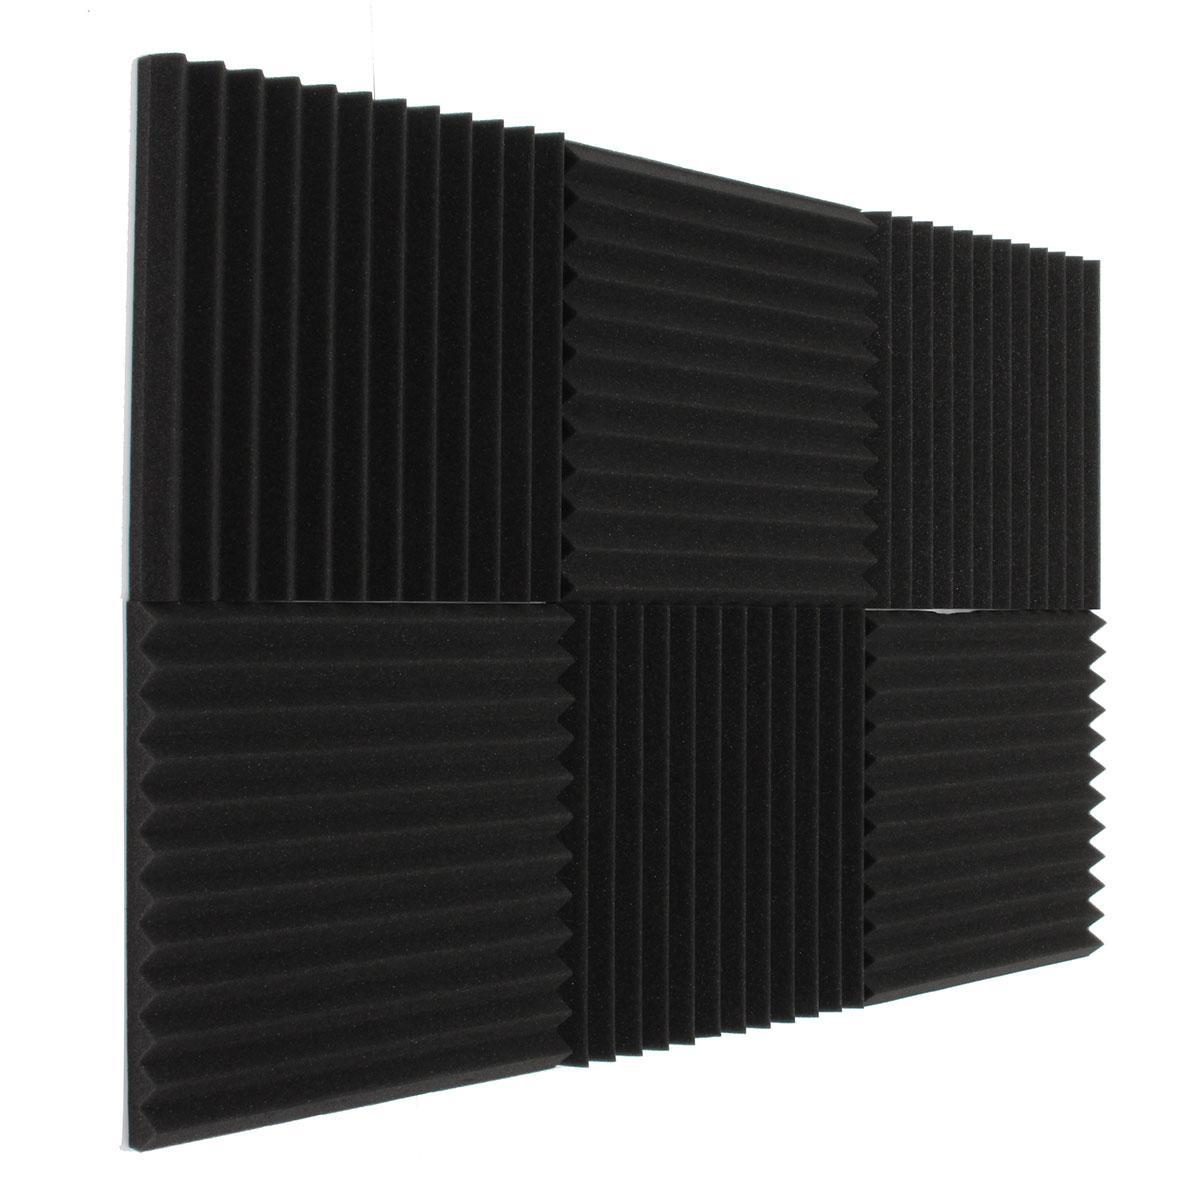 newest 6x acoustic foam wedge tiles studio sound proofing ro